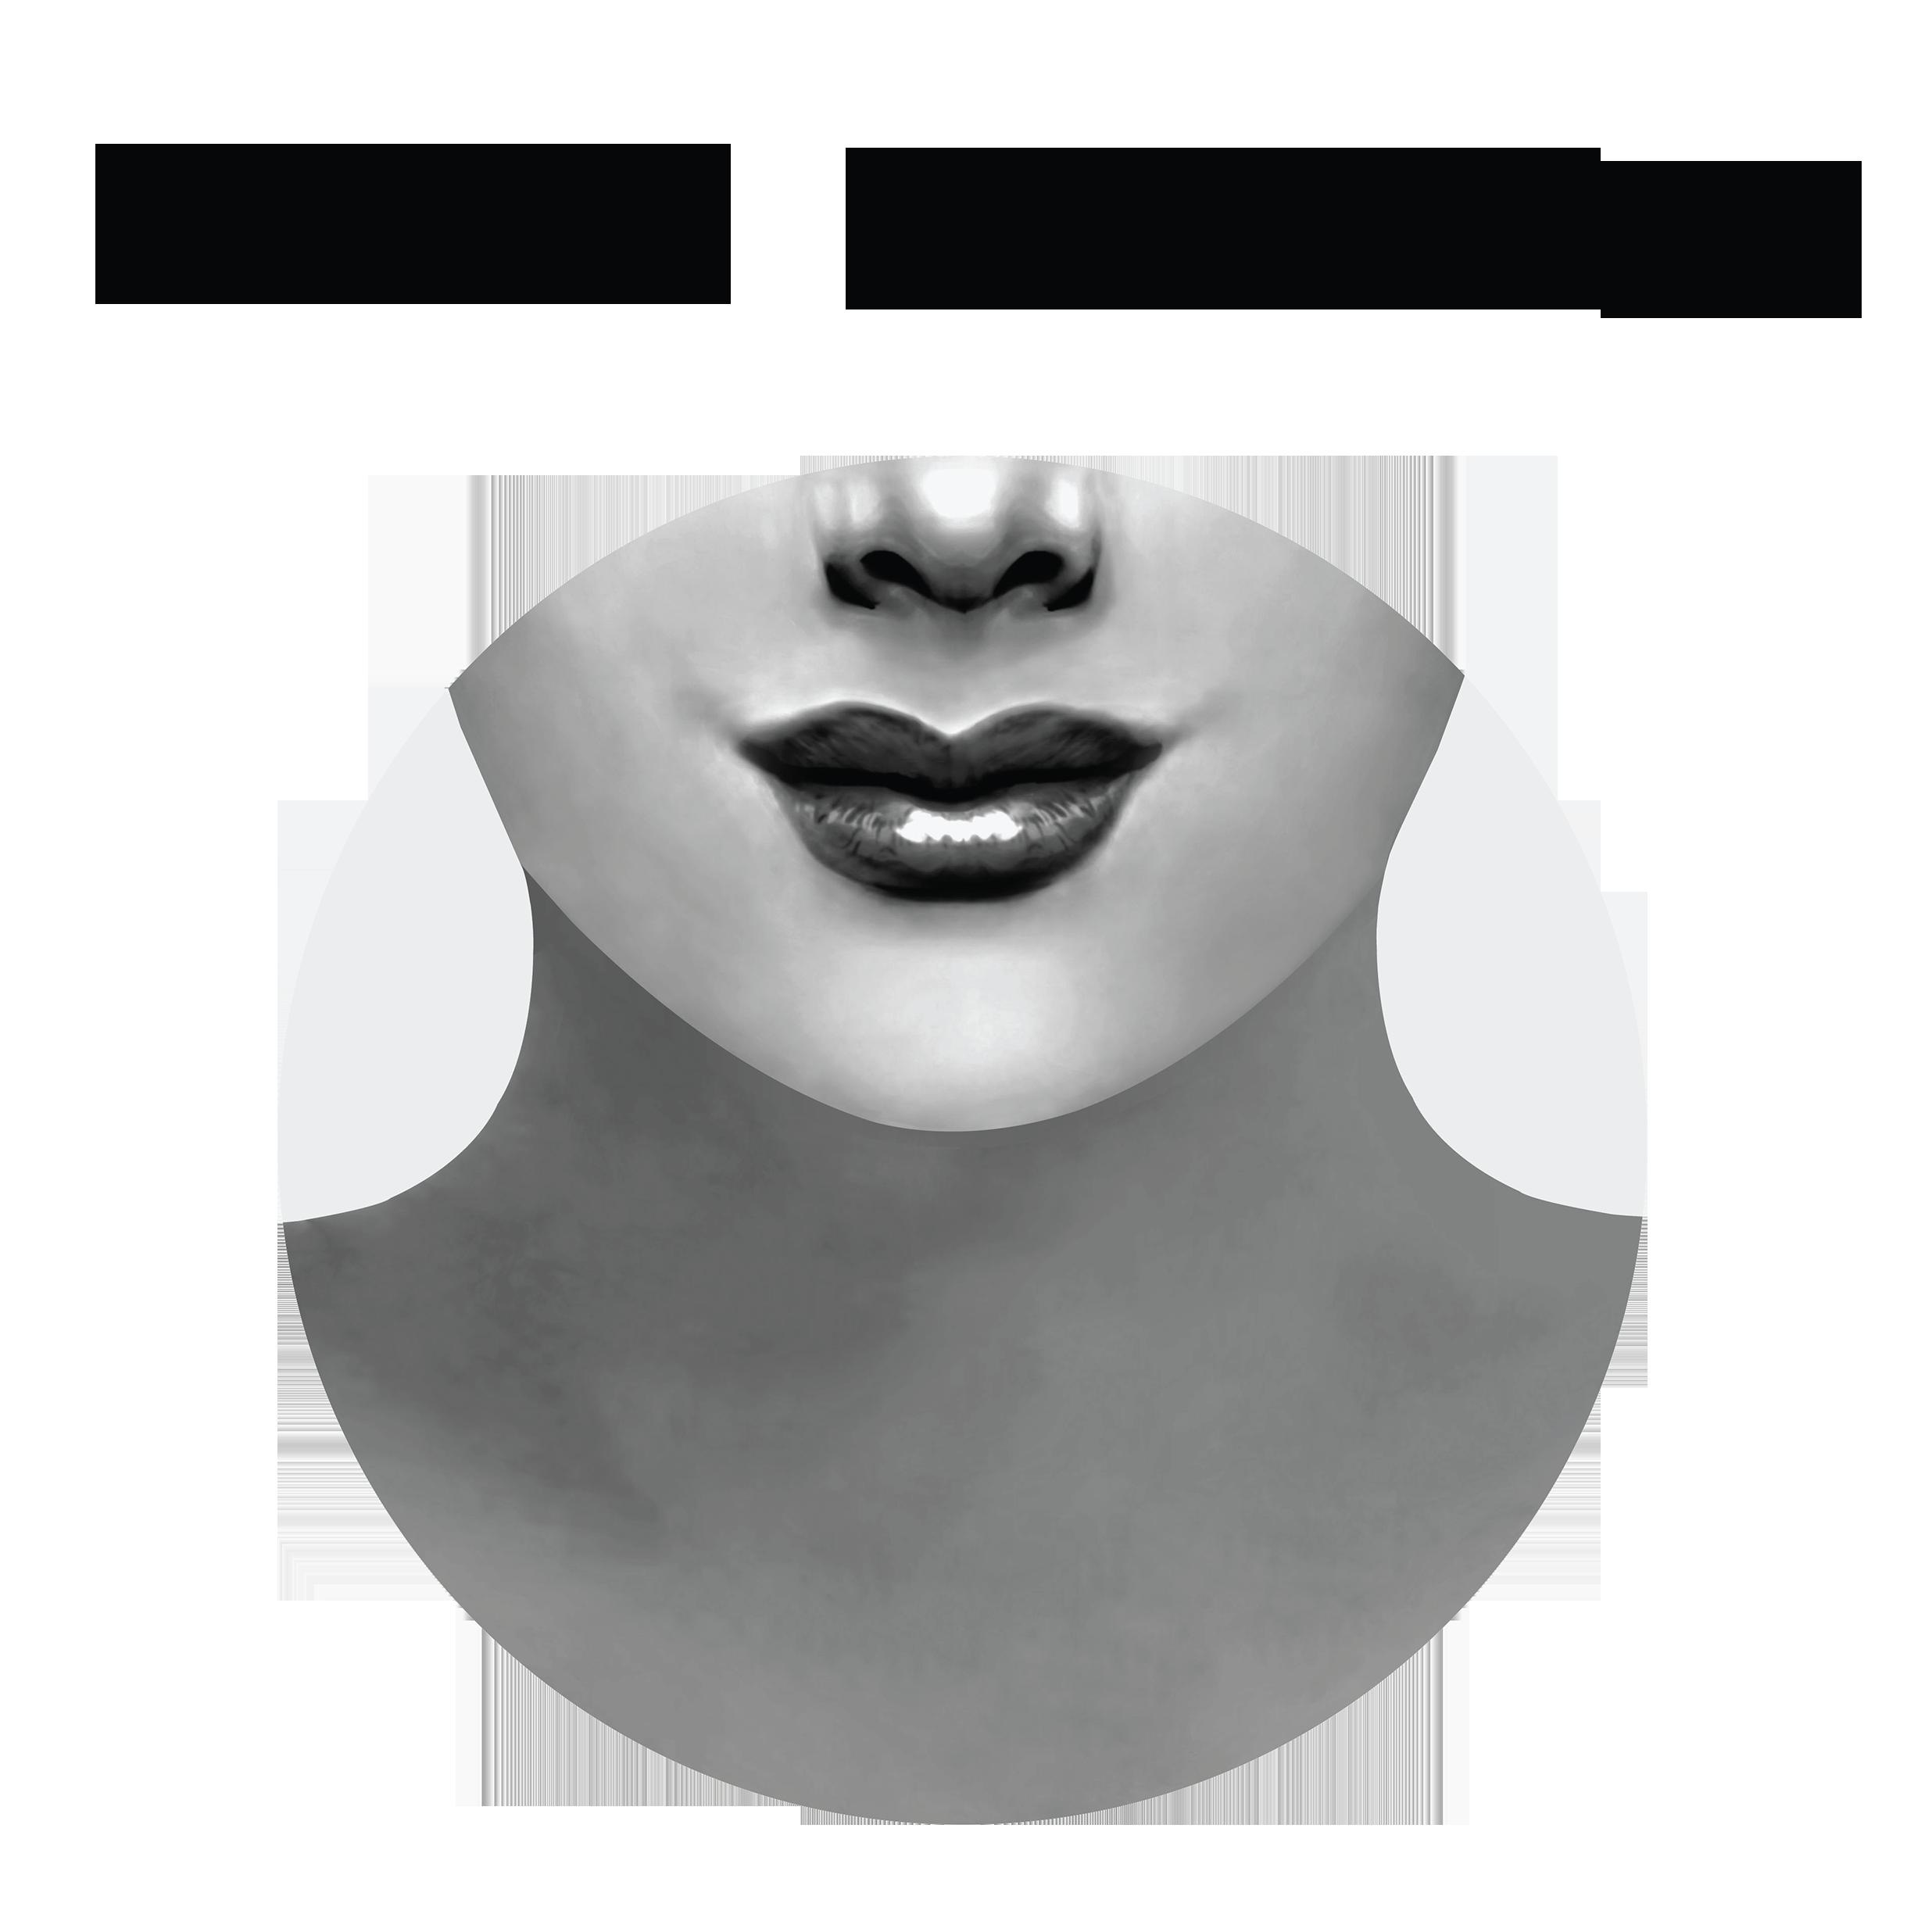 BRAILLIANT | Contemporary, Fashion & Pop Art Prints